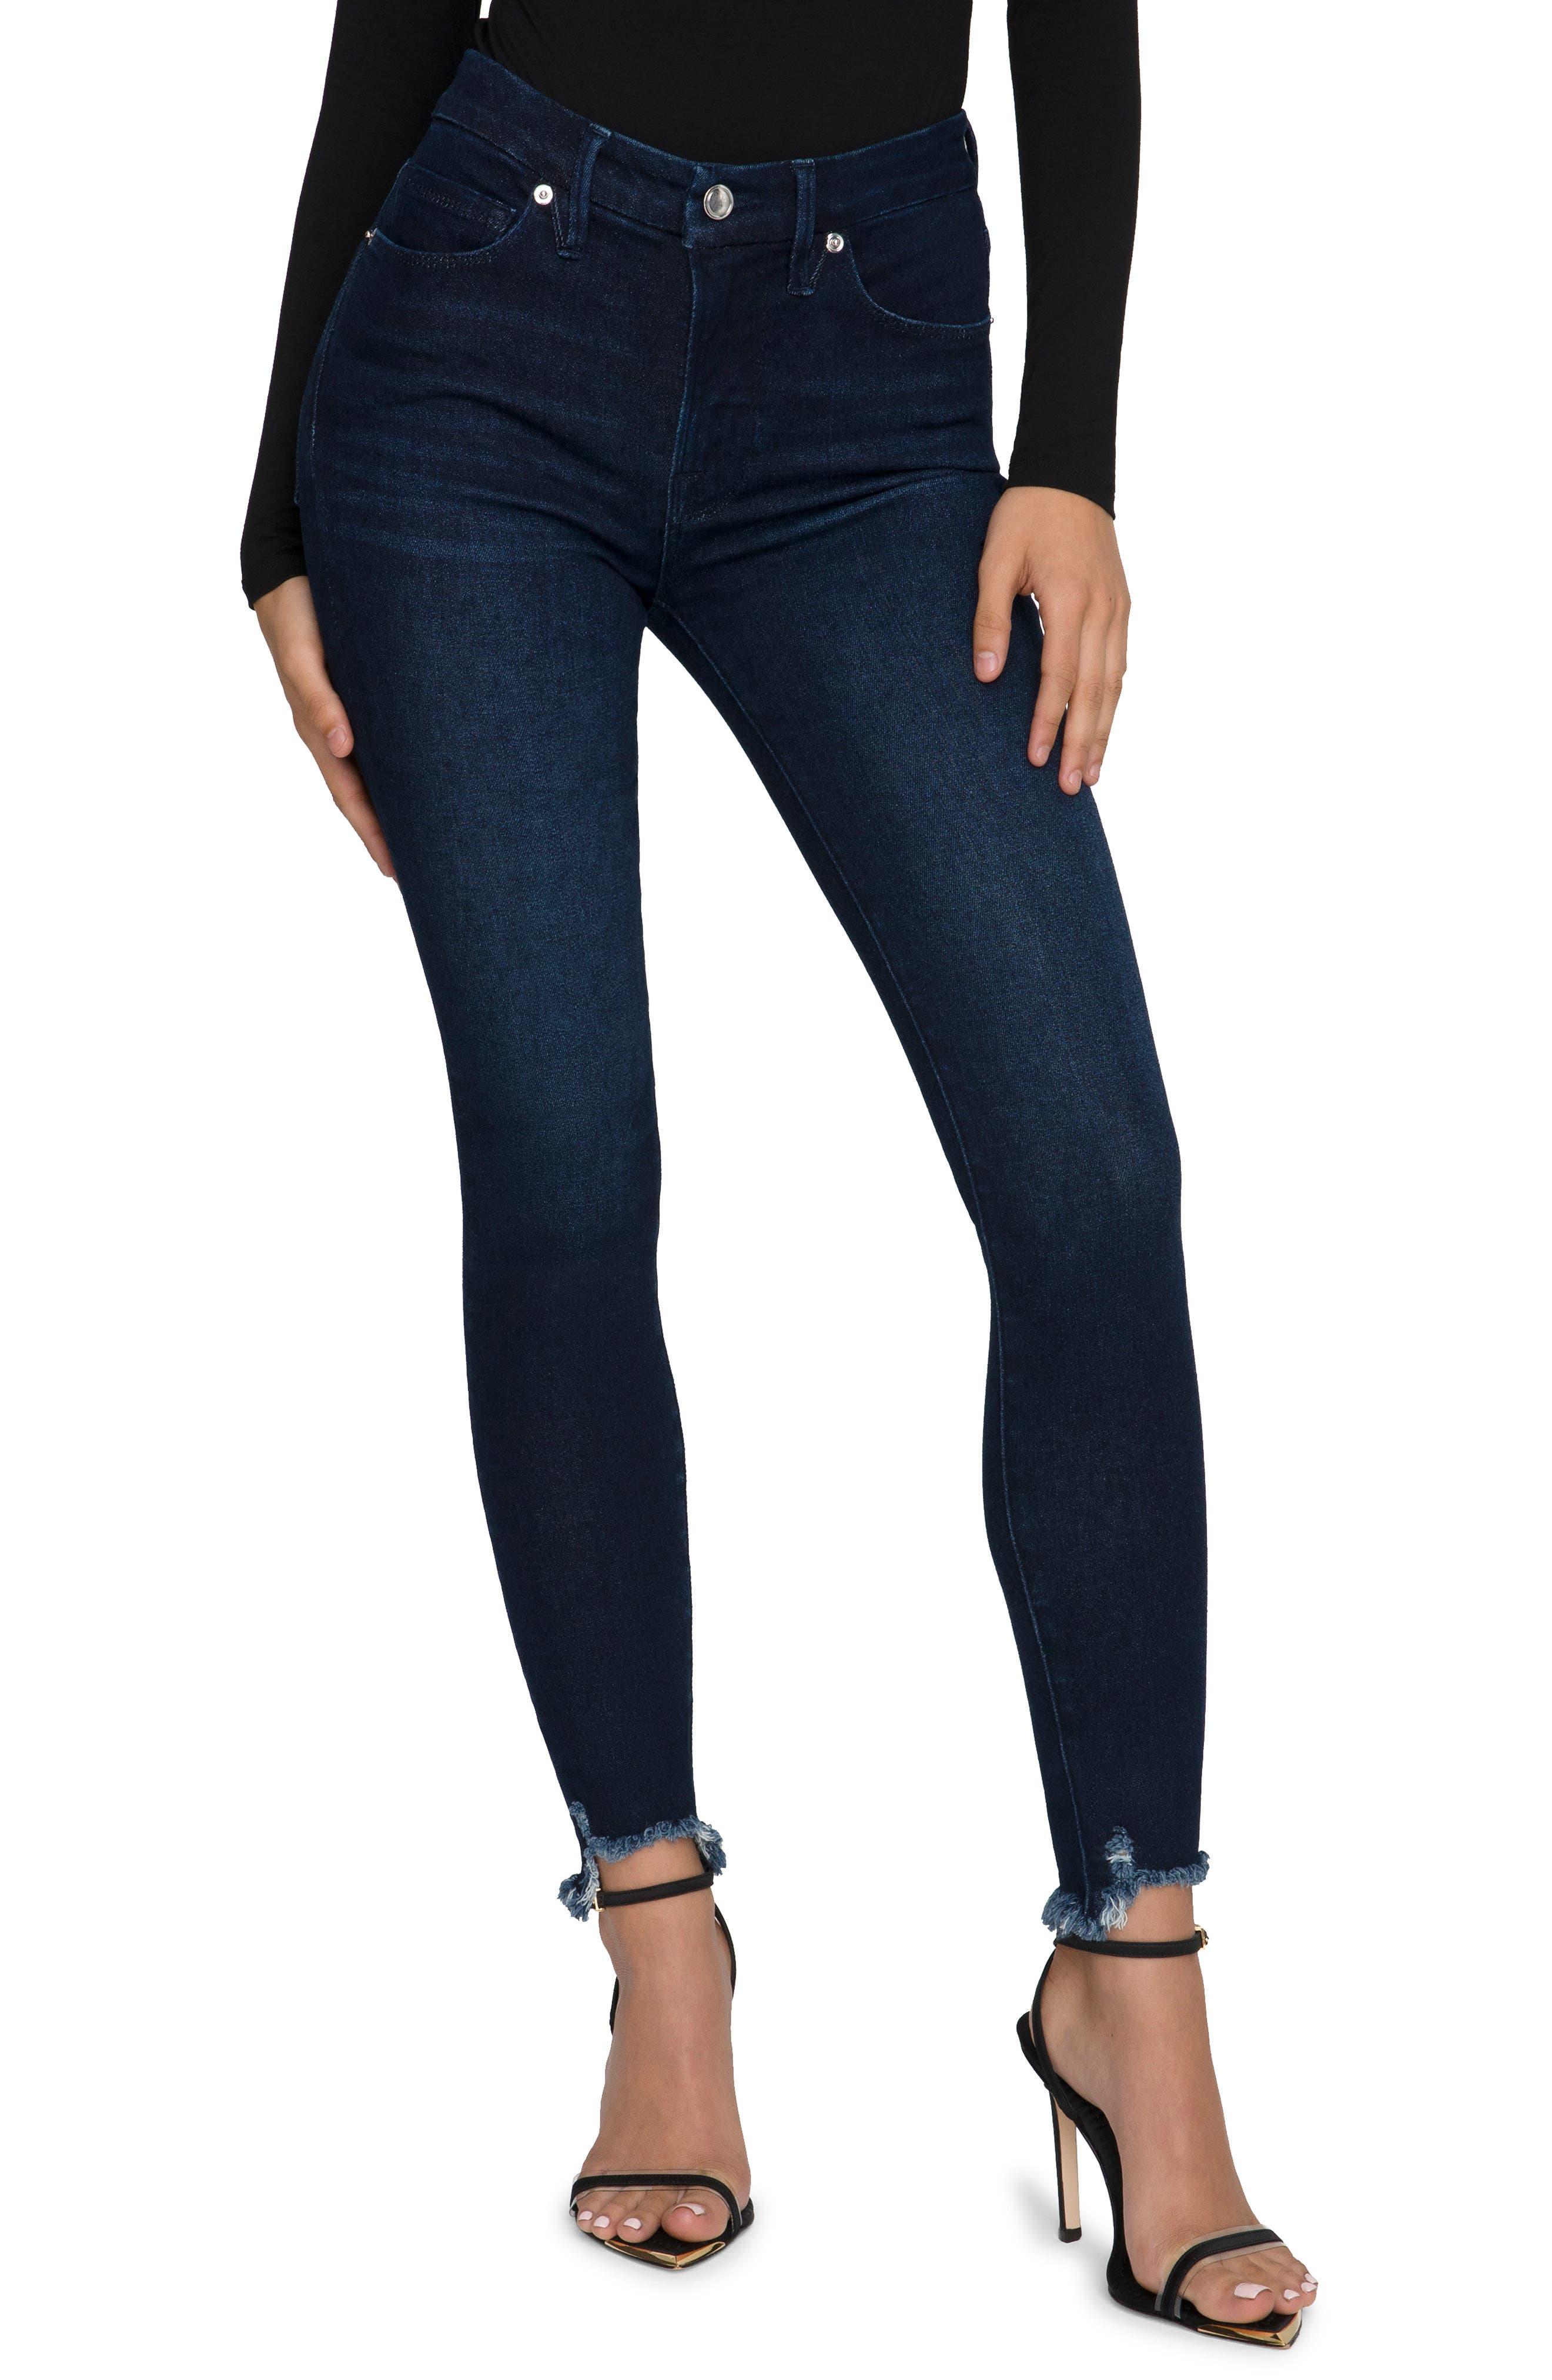 Women's Good American Good Legs Chew Back Pocket High Waist Skinny Jeans